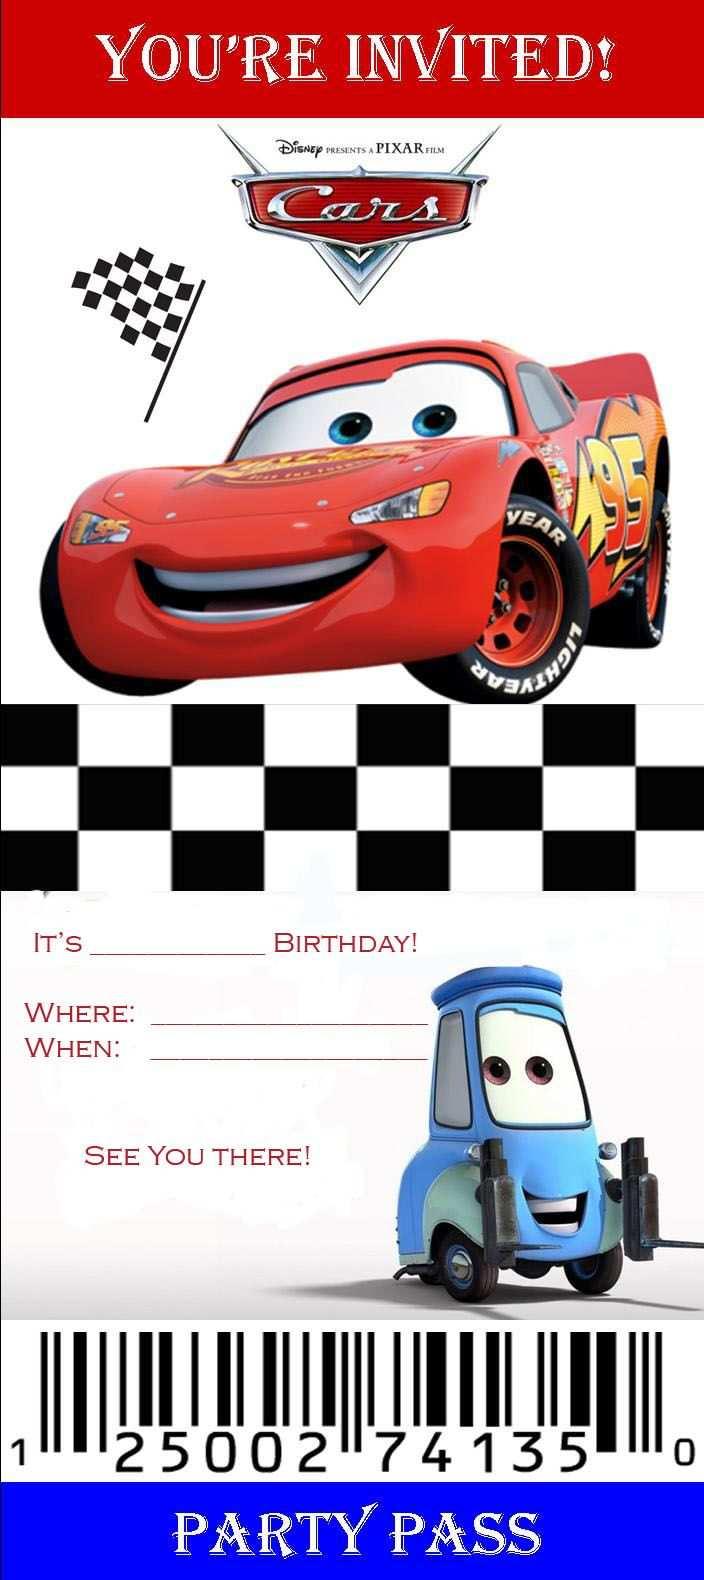 Free Invite3 1 Jpg 704 1 580 Pixels Cars Birthday Invitations Disney Cars Party Disney Cars Birthday